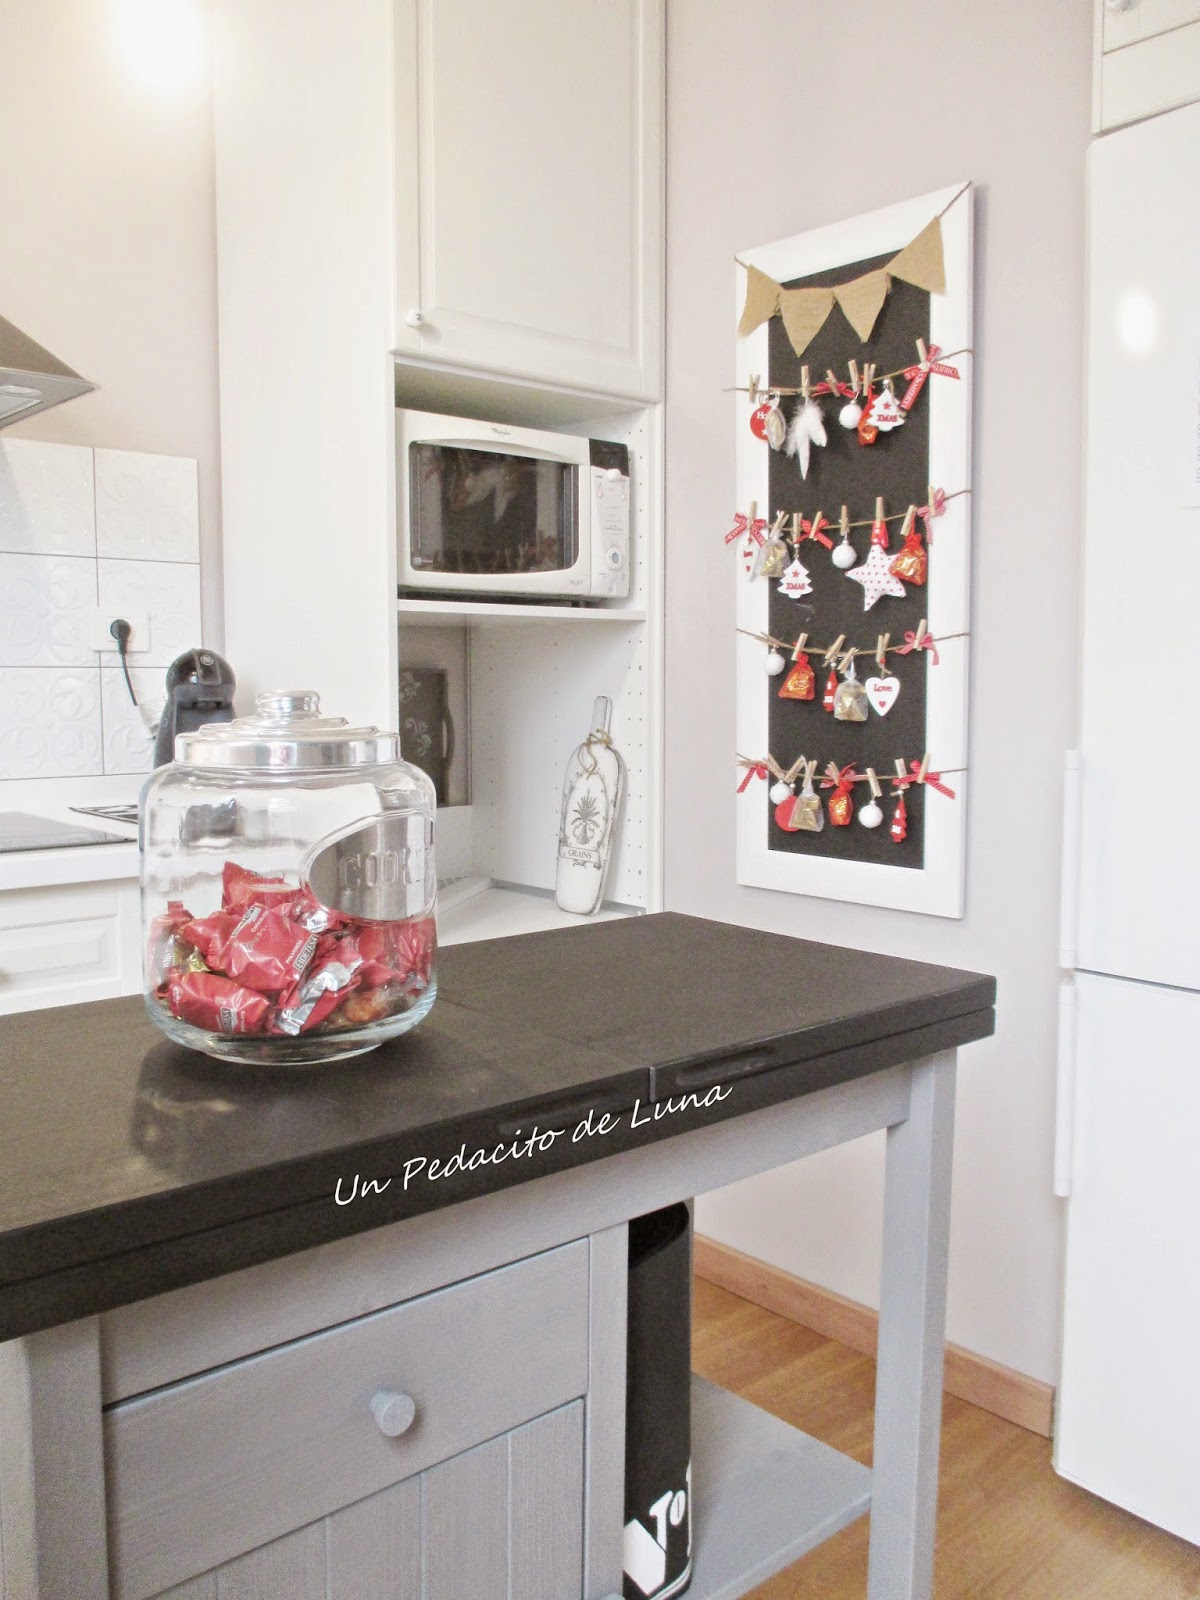 nouvelle cuisine trocito de luna at home. Black Bedroom Furniture Sets. Home Design Ideas